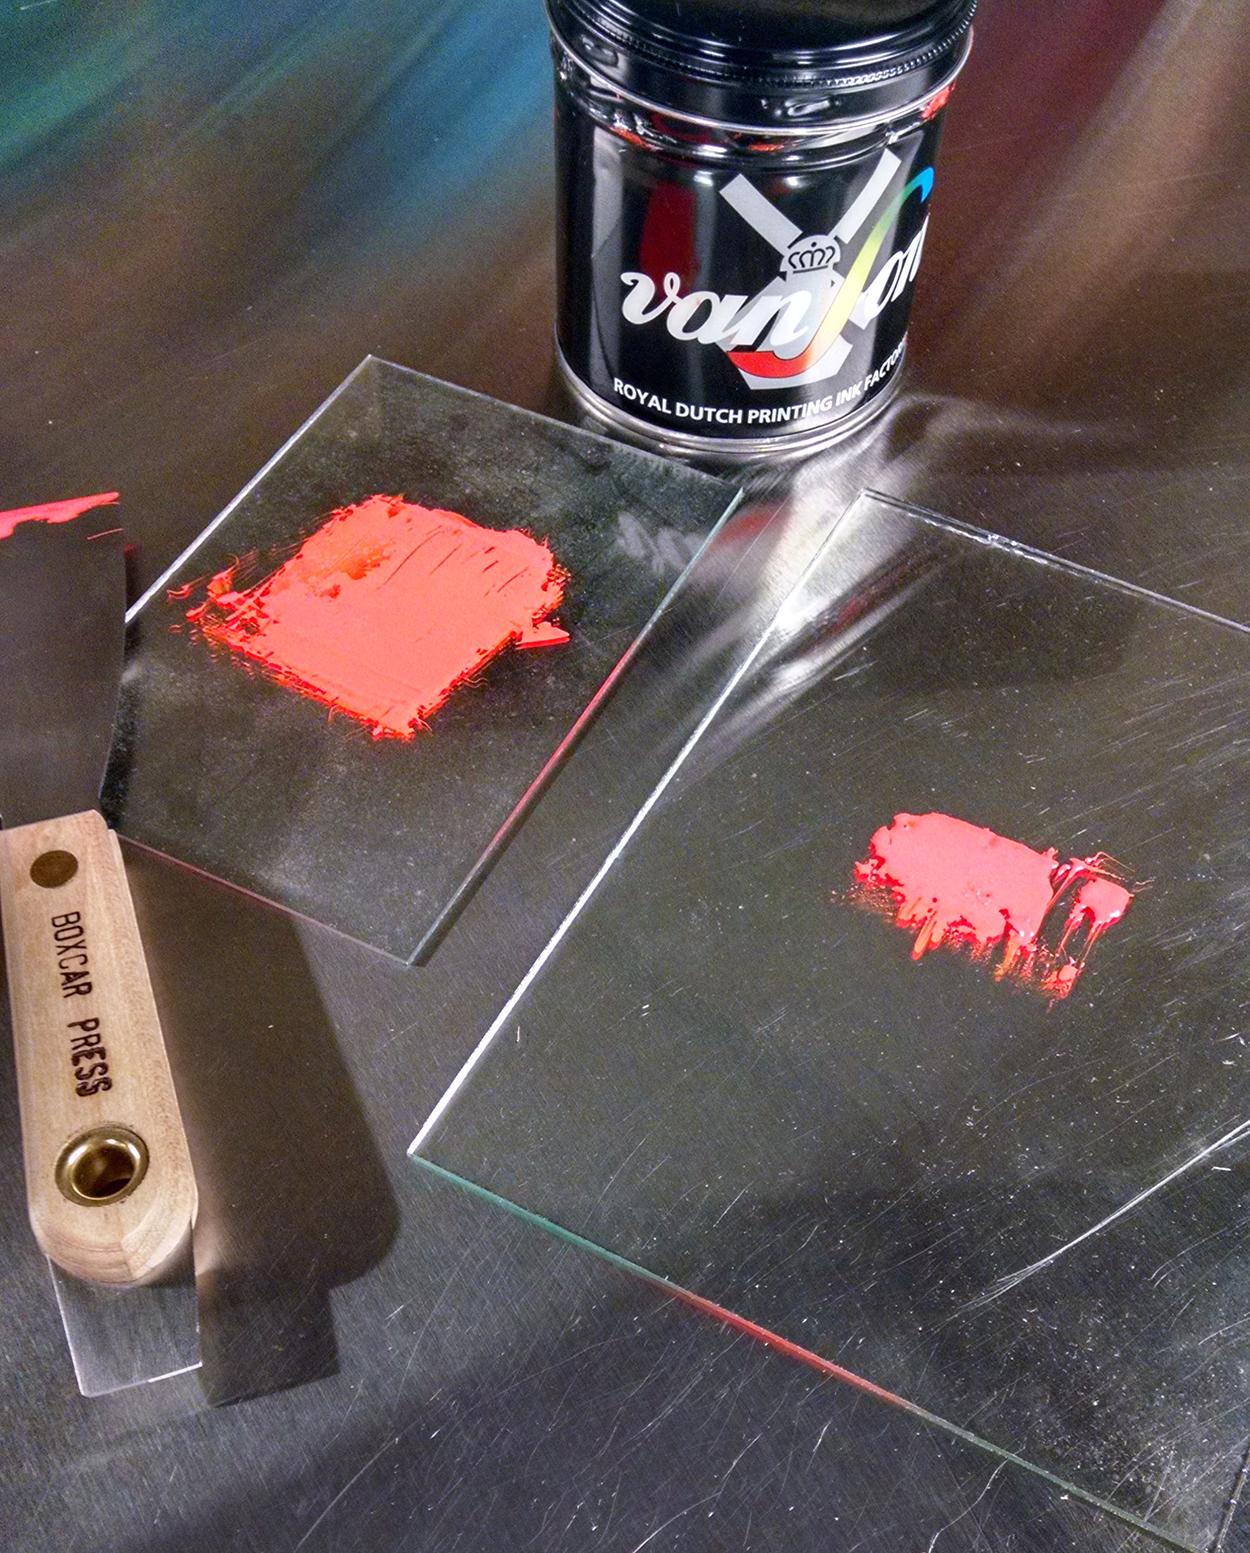 Twp ink plates for L Letterpress DIY printing.